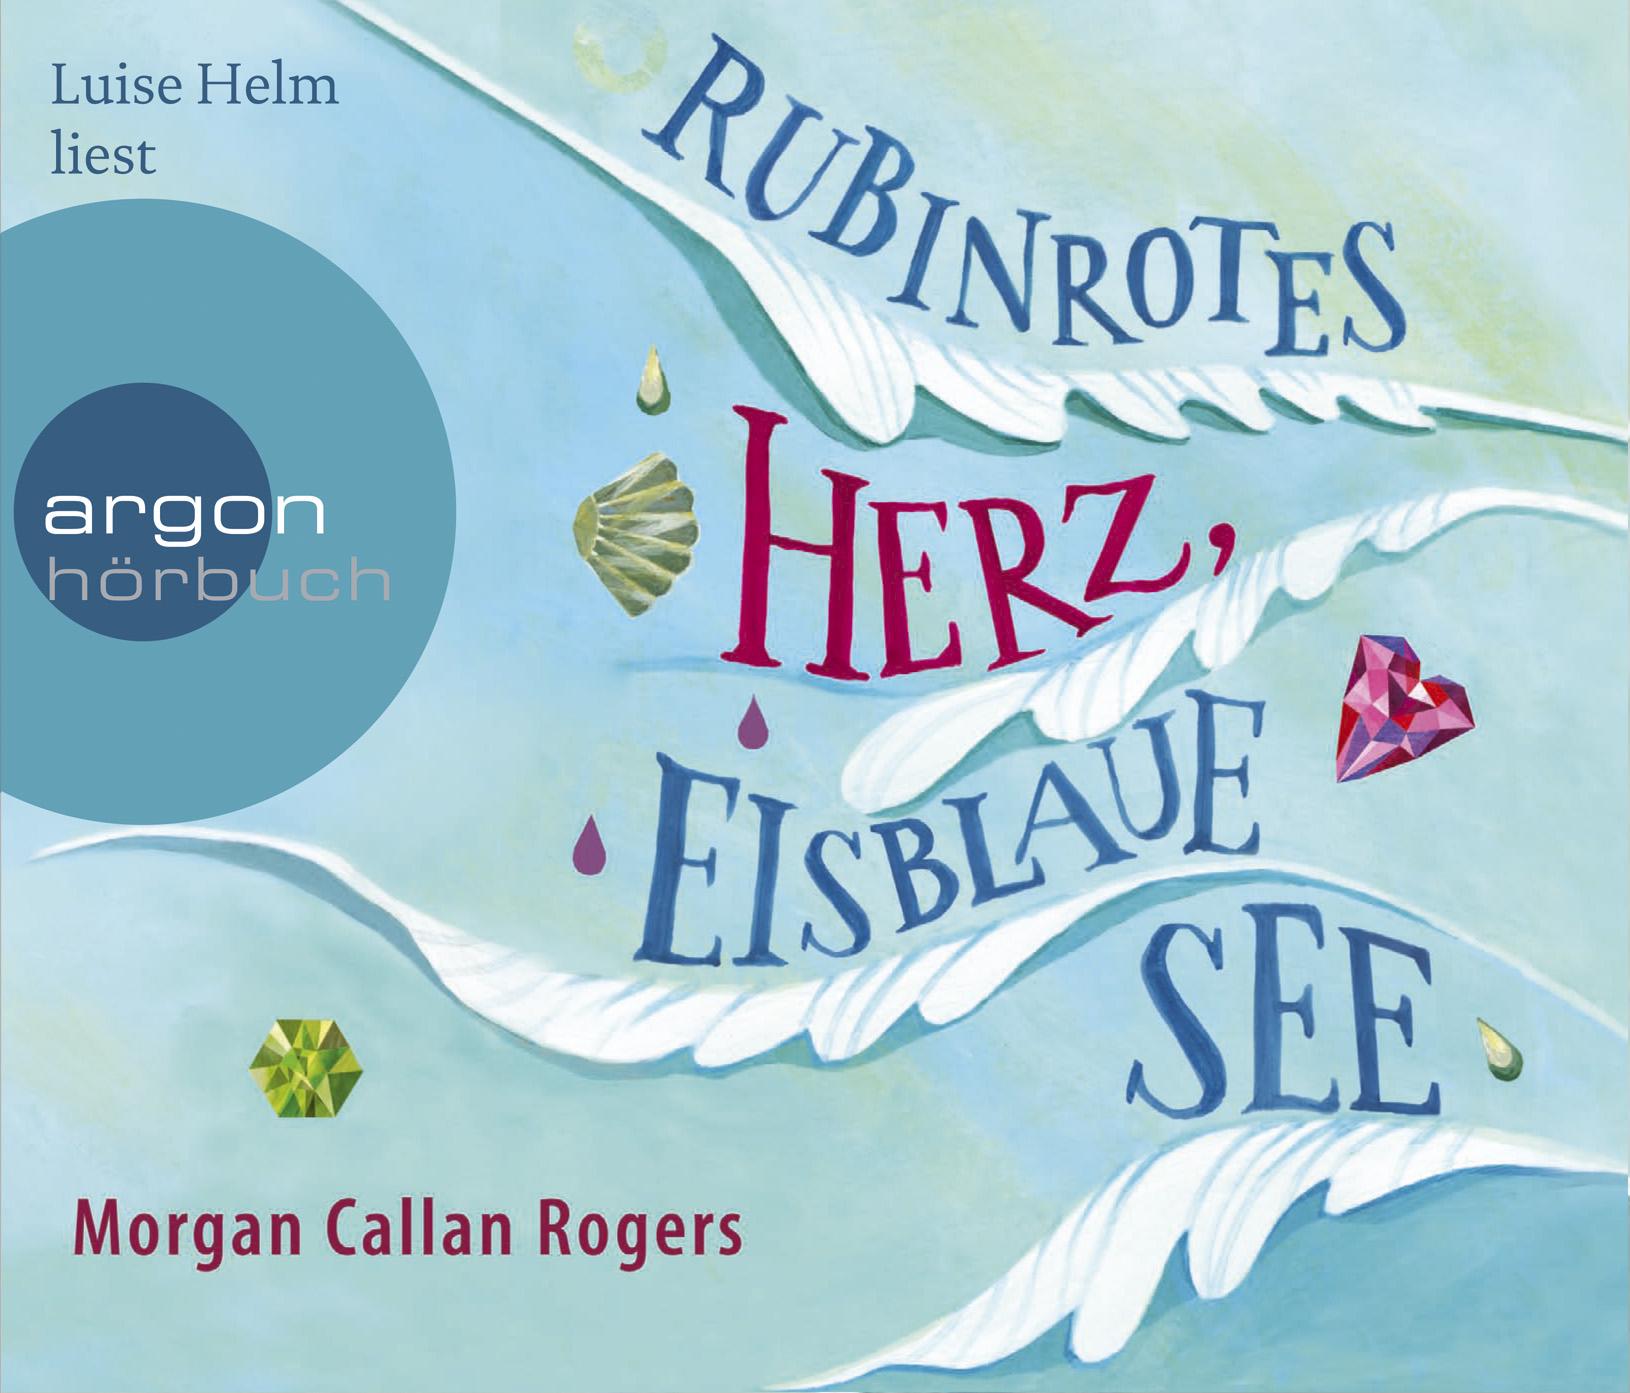 Morgan Callan Rogers - Rubinrotes Herz, eisblaue See